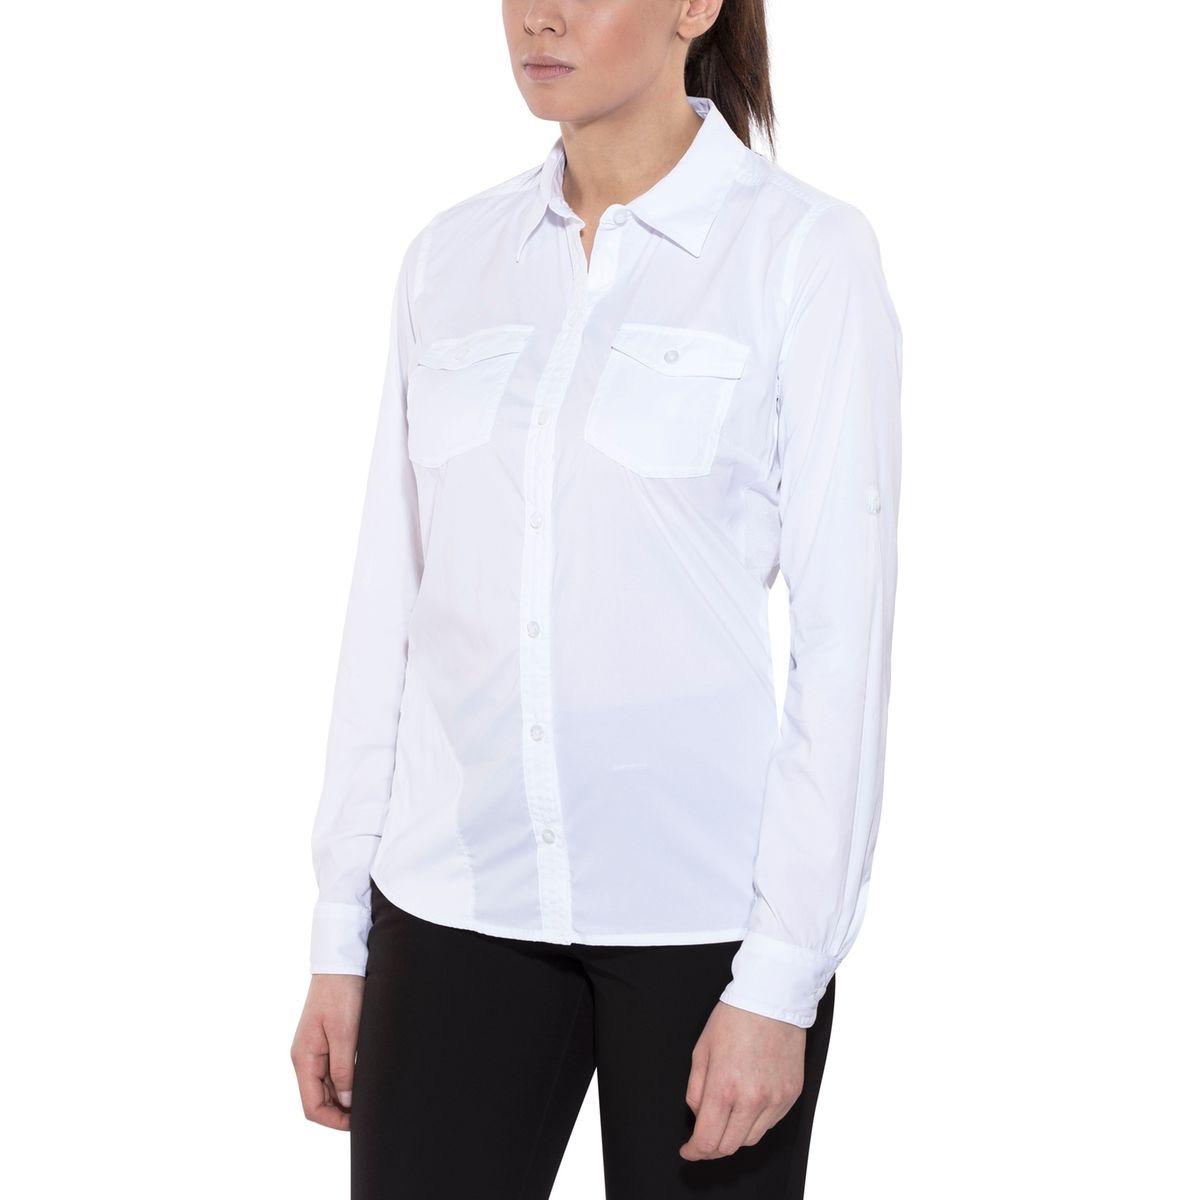 Annika - Chemise manches longues - blanc